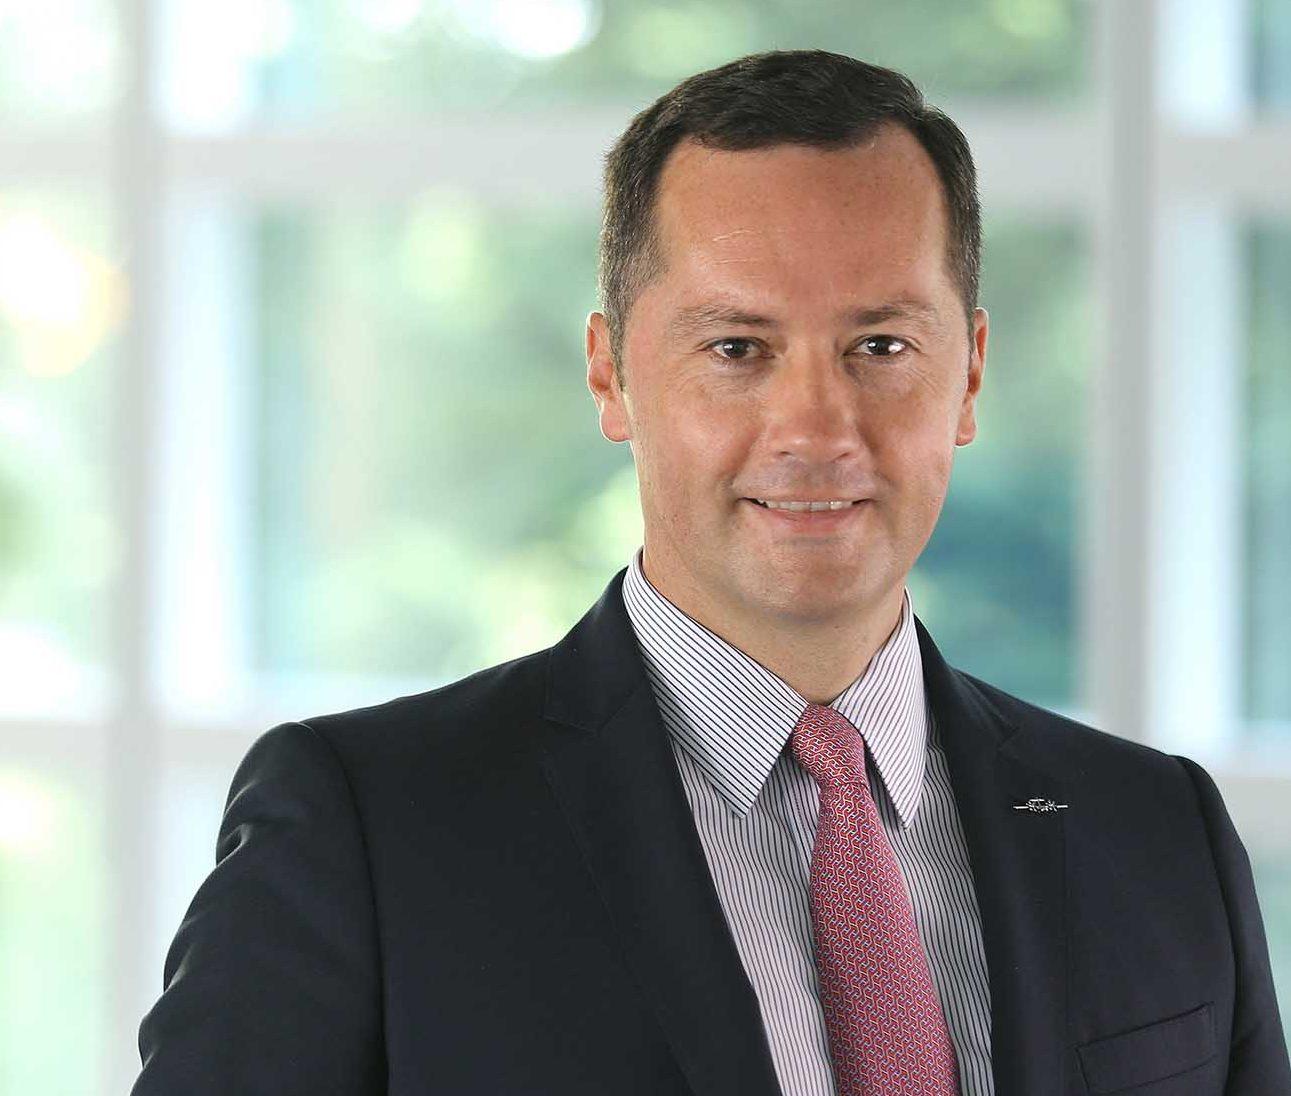 Patrick de Castelbajac nominated Company Secretary and Chief of Staff at Airbus